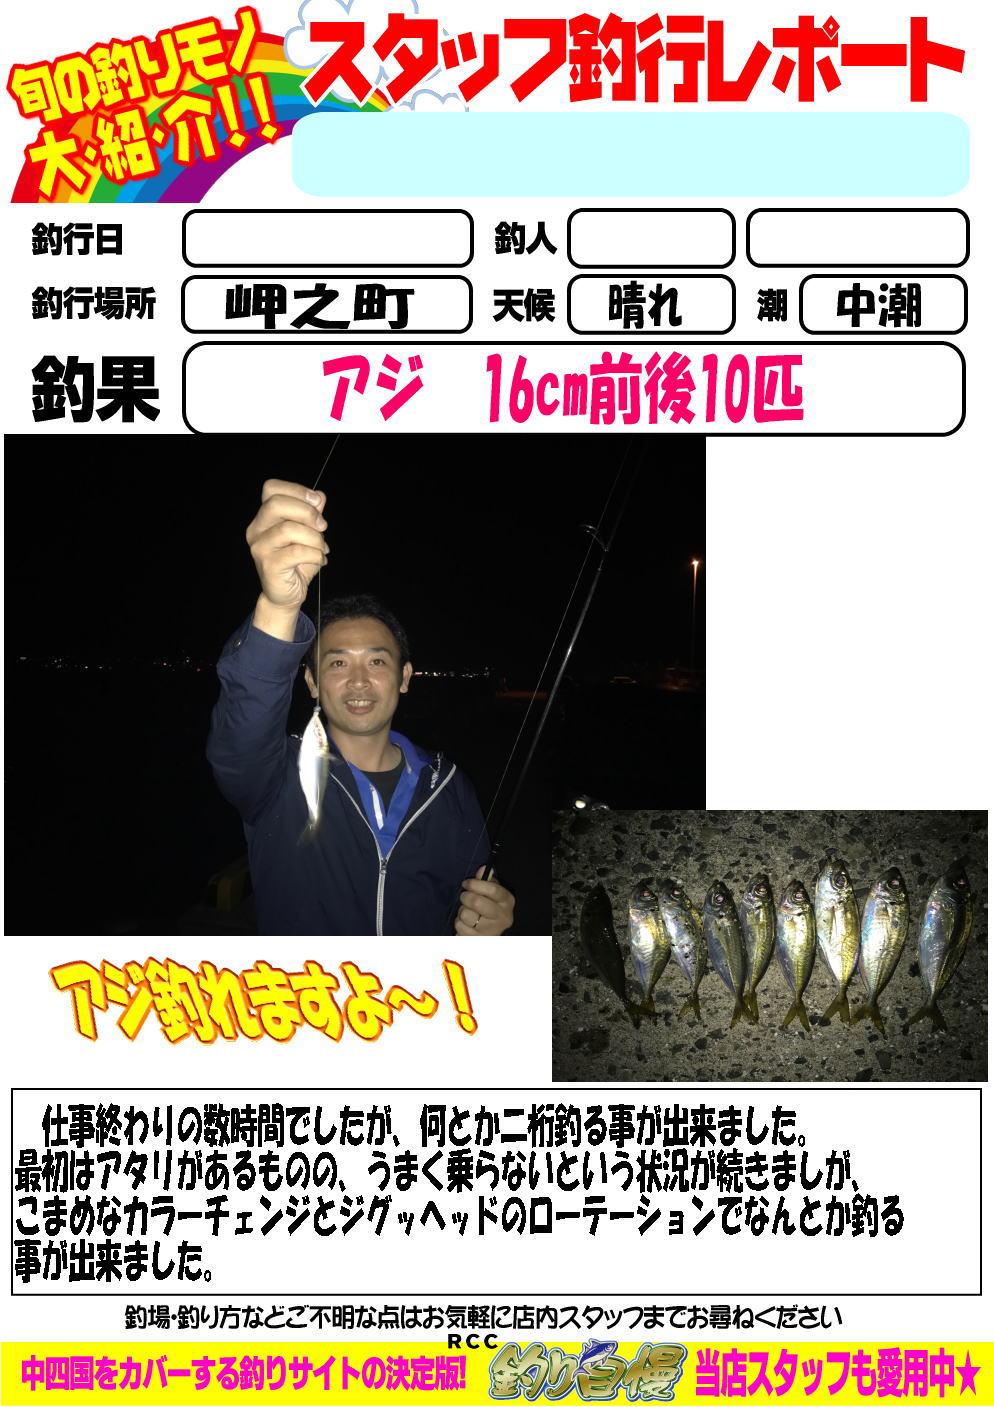 http://www.e-angle.co.jp/shop/blog/20161019%E3%81%82%E3%81%98.jpg